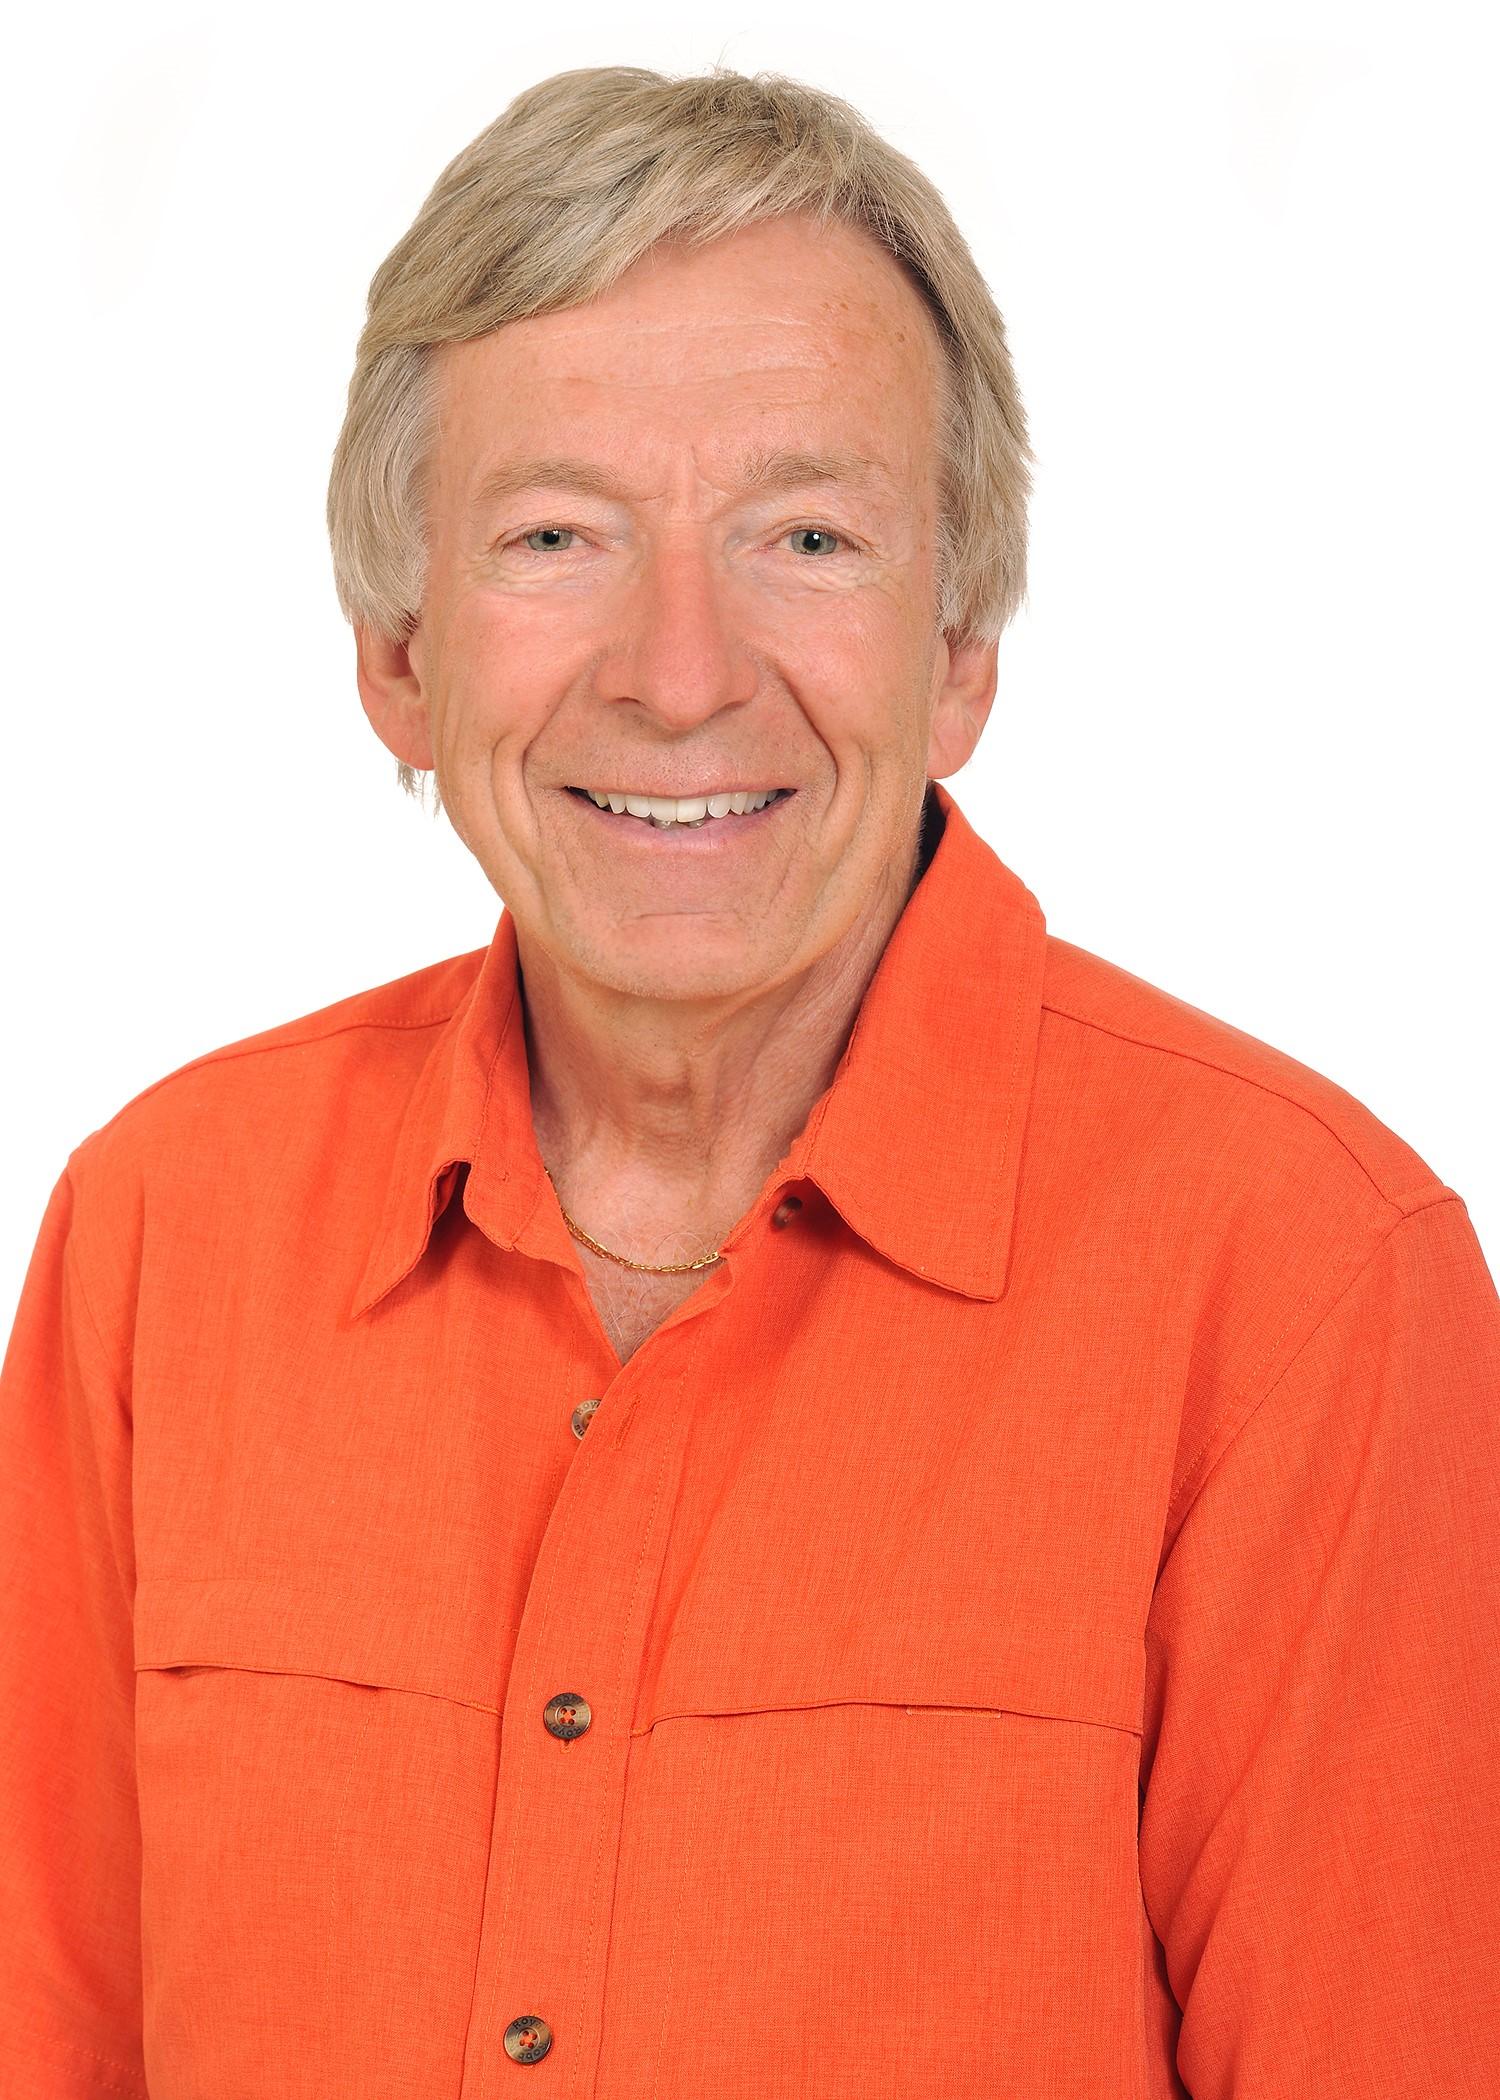 Raymond Picard